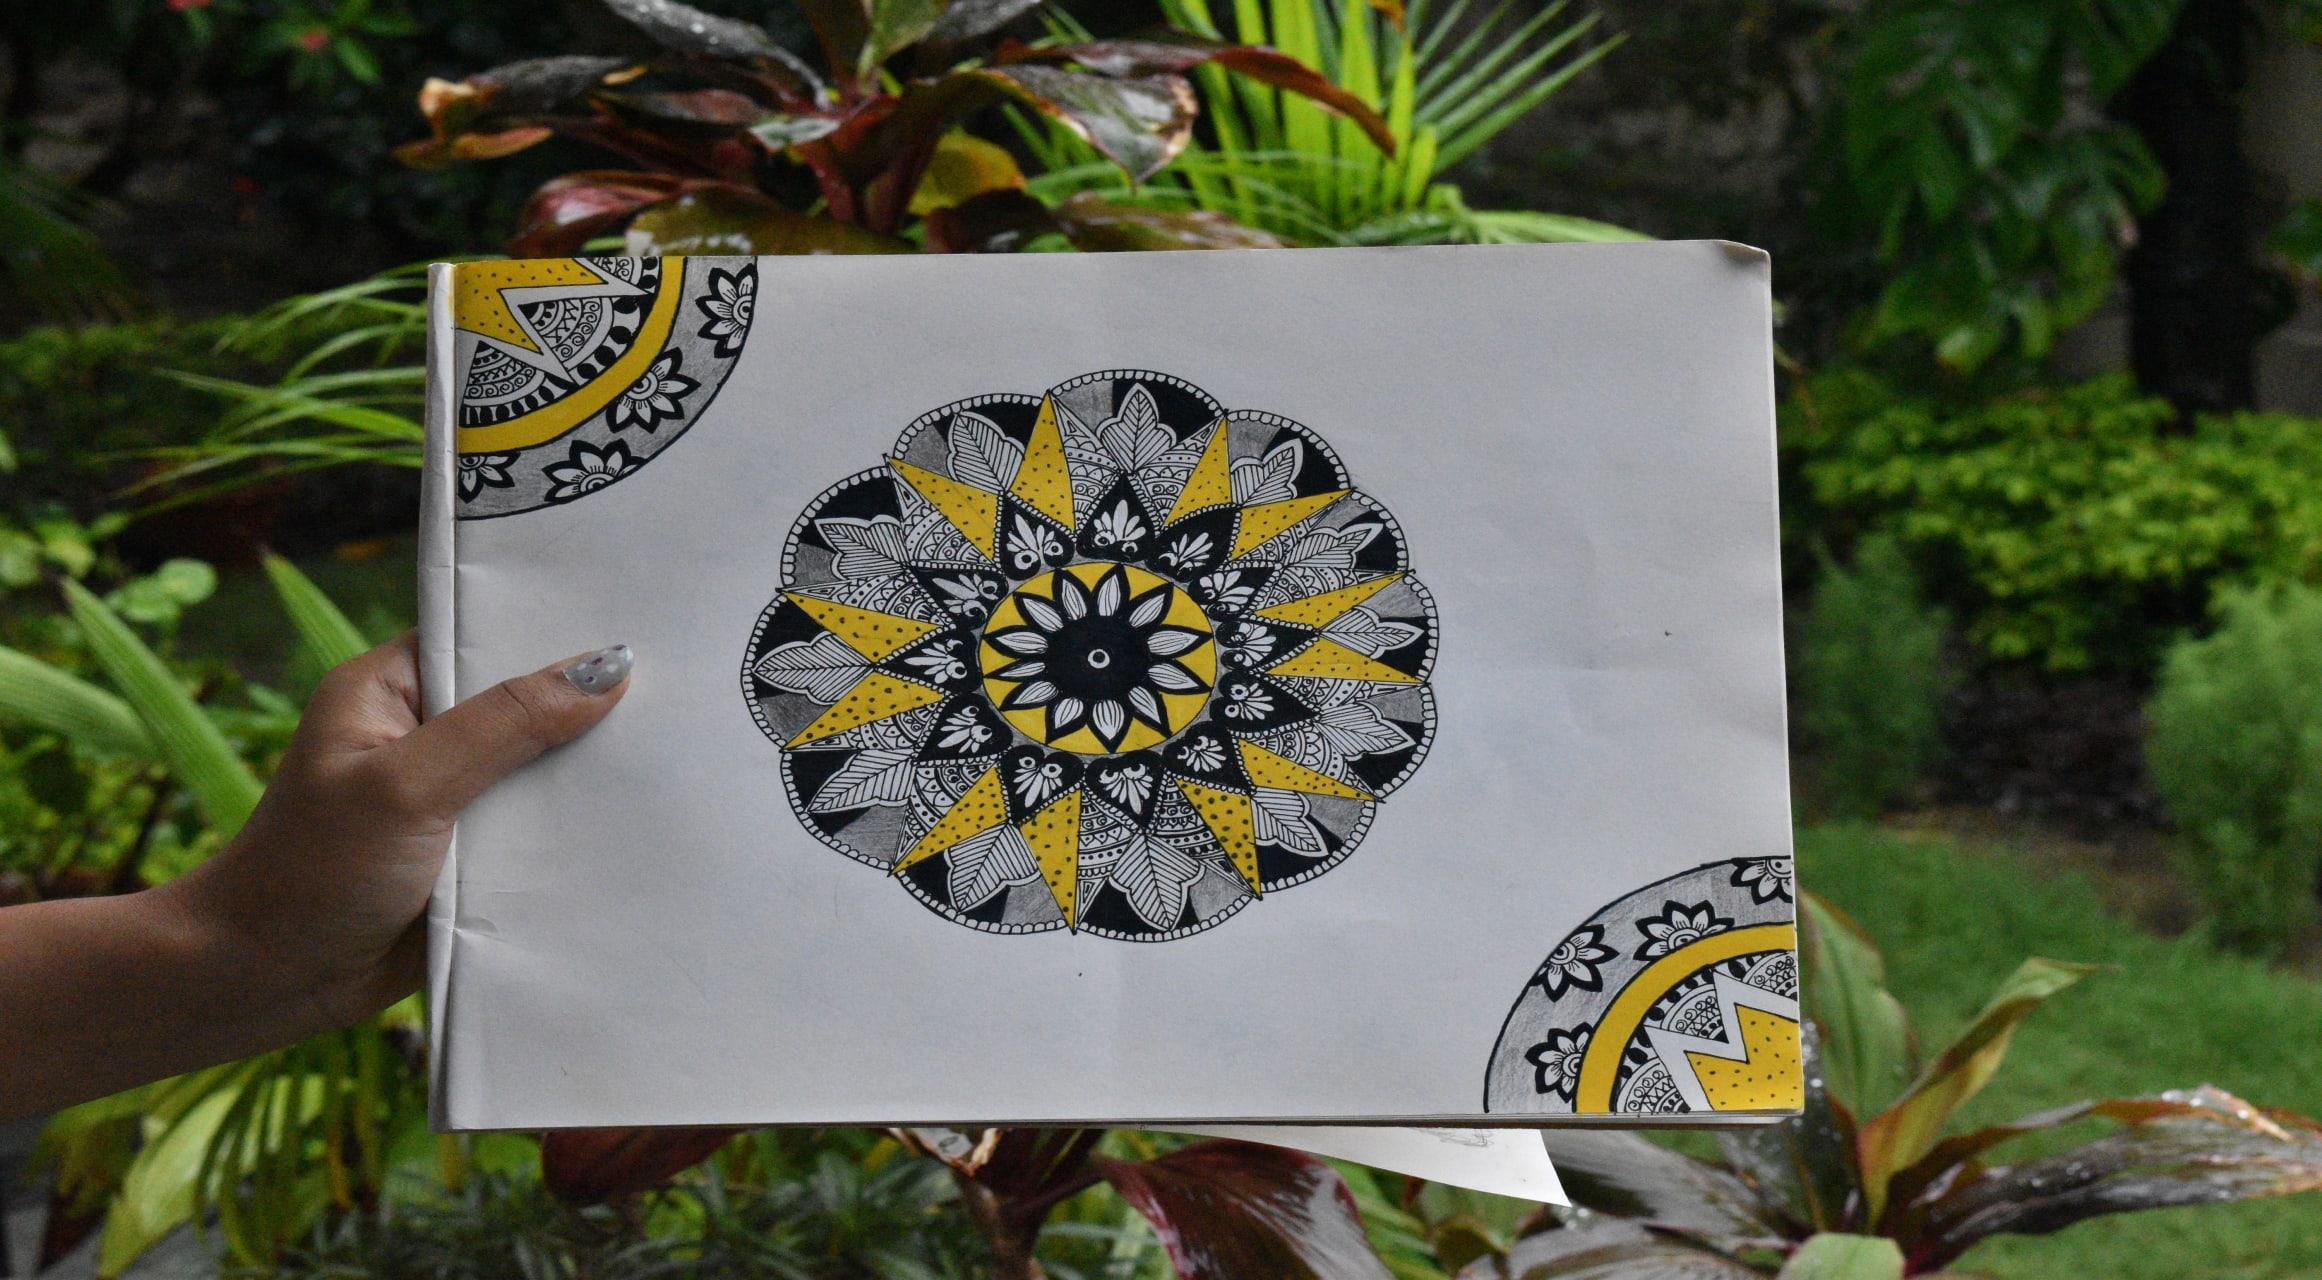 Delhi - Find Peace Through Art